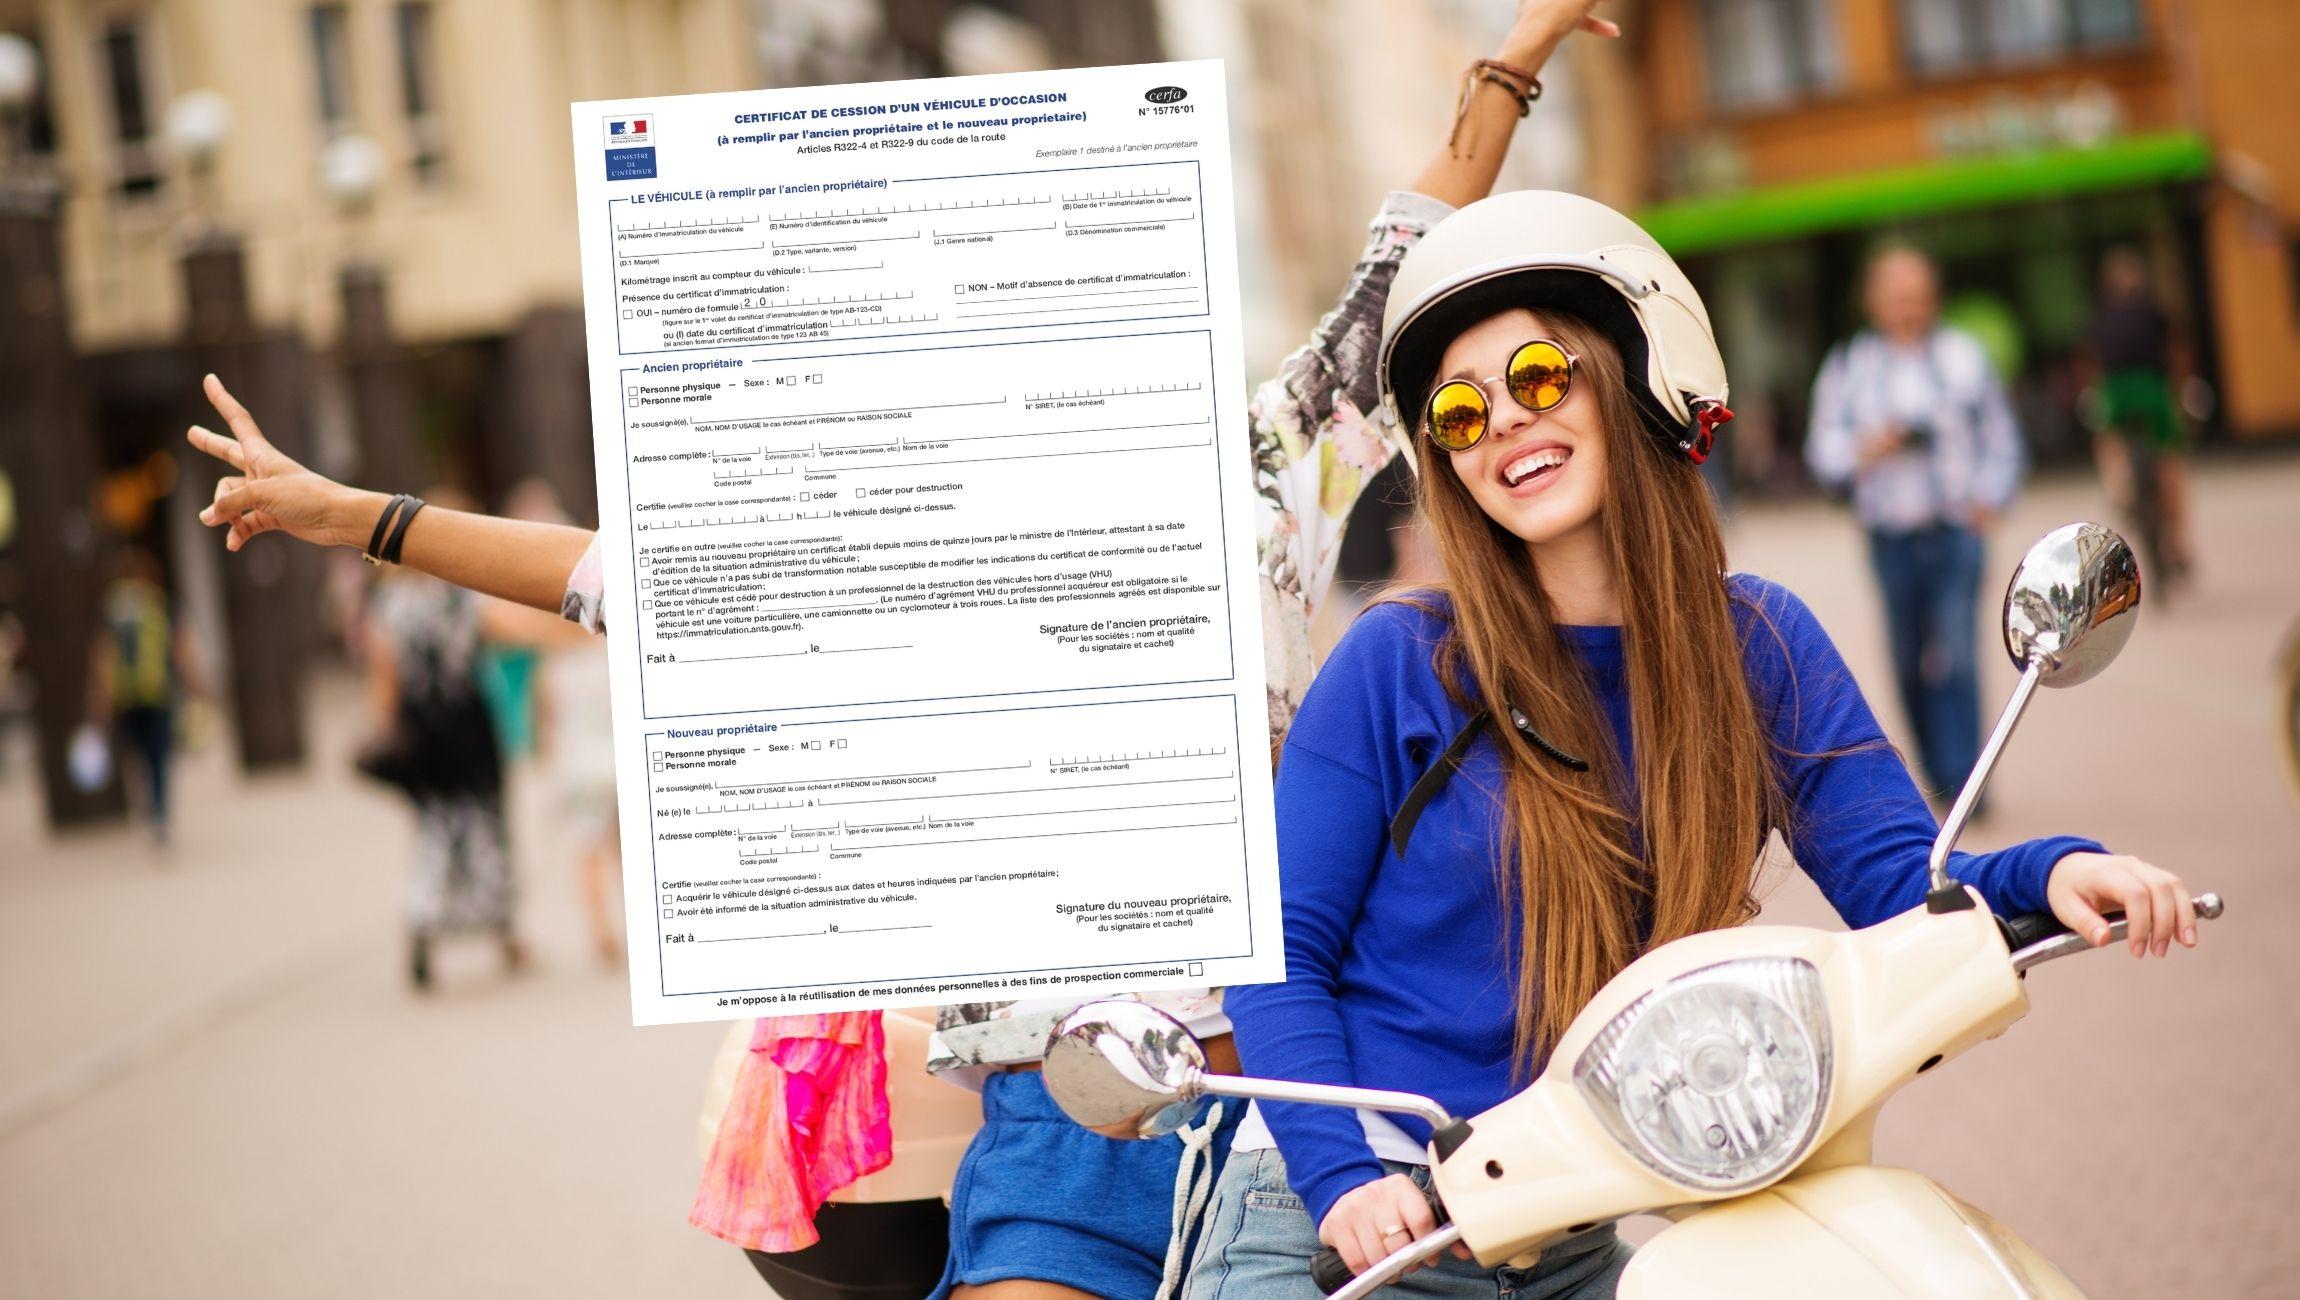 Certificat de cession scooter